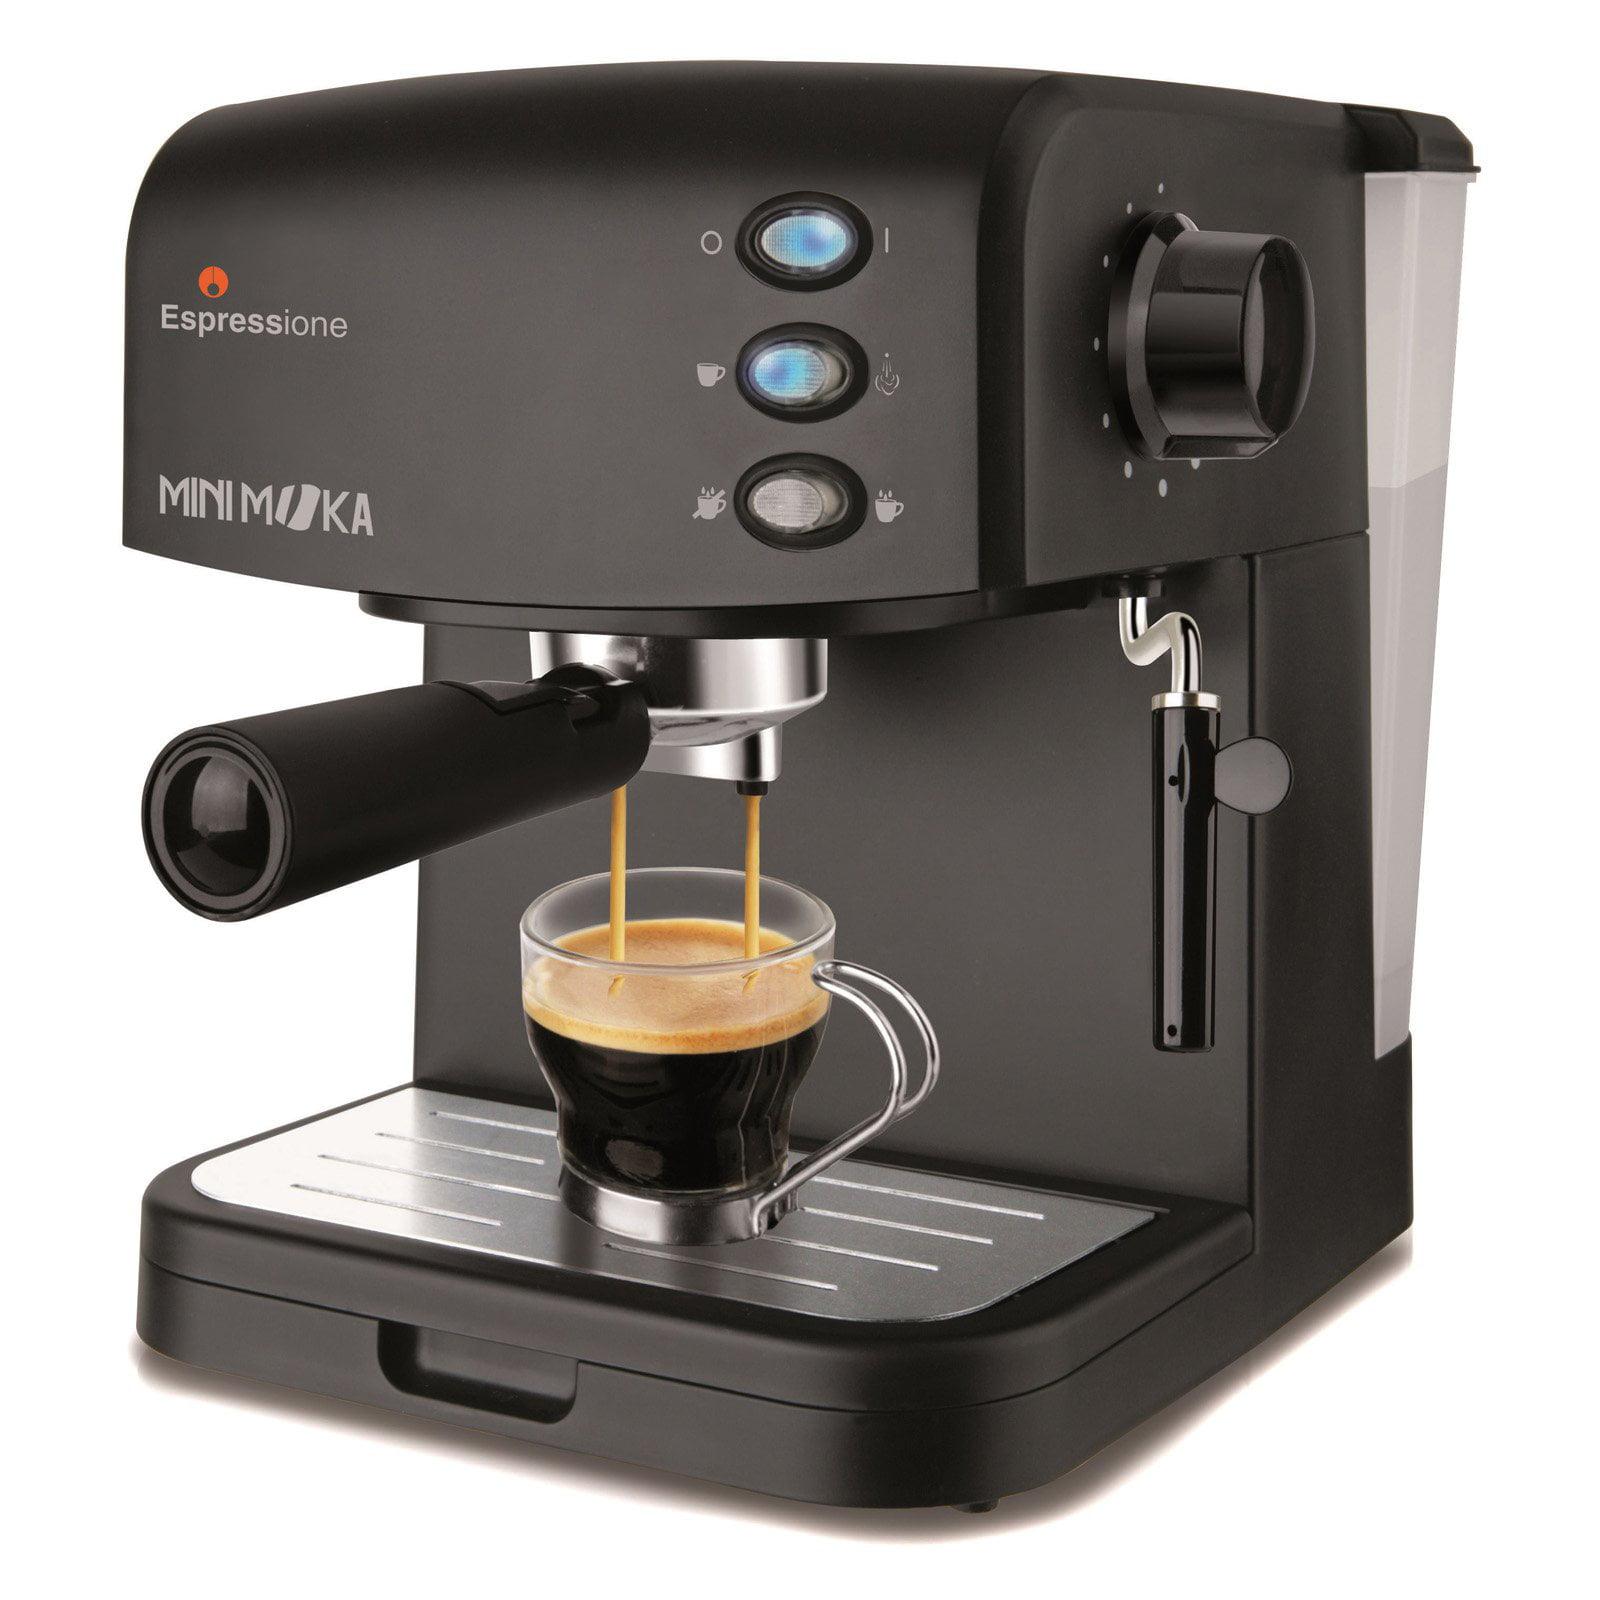 Espressione CM-1695 Minimoka Espresso Machine